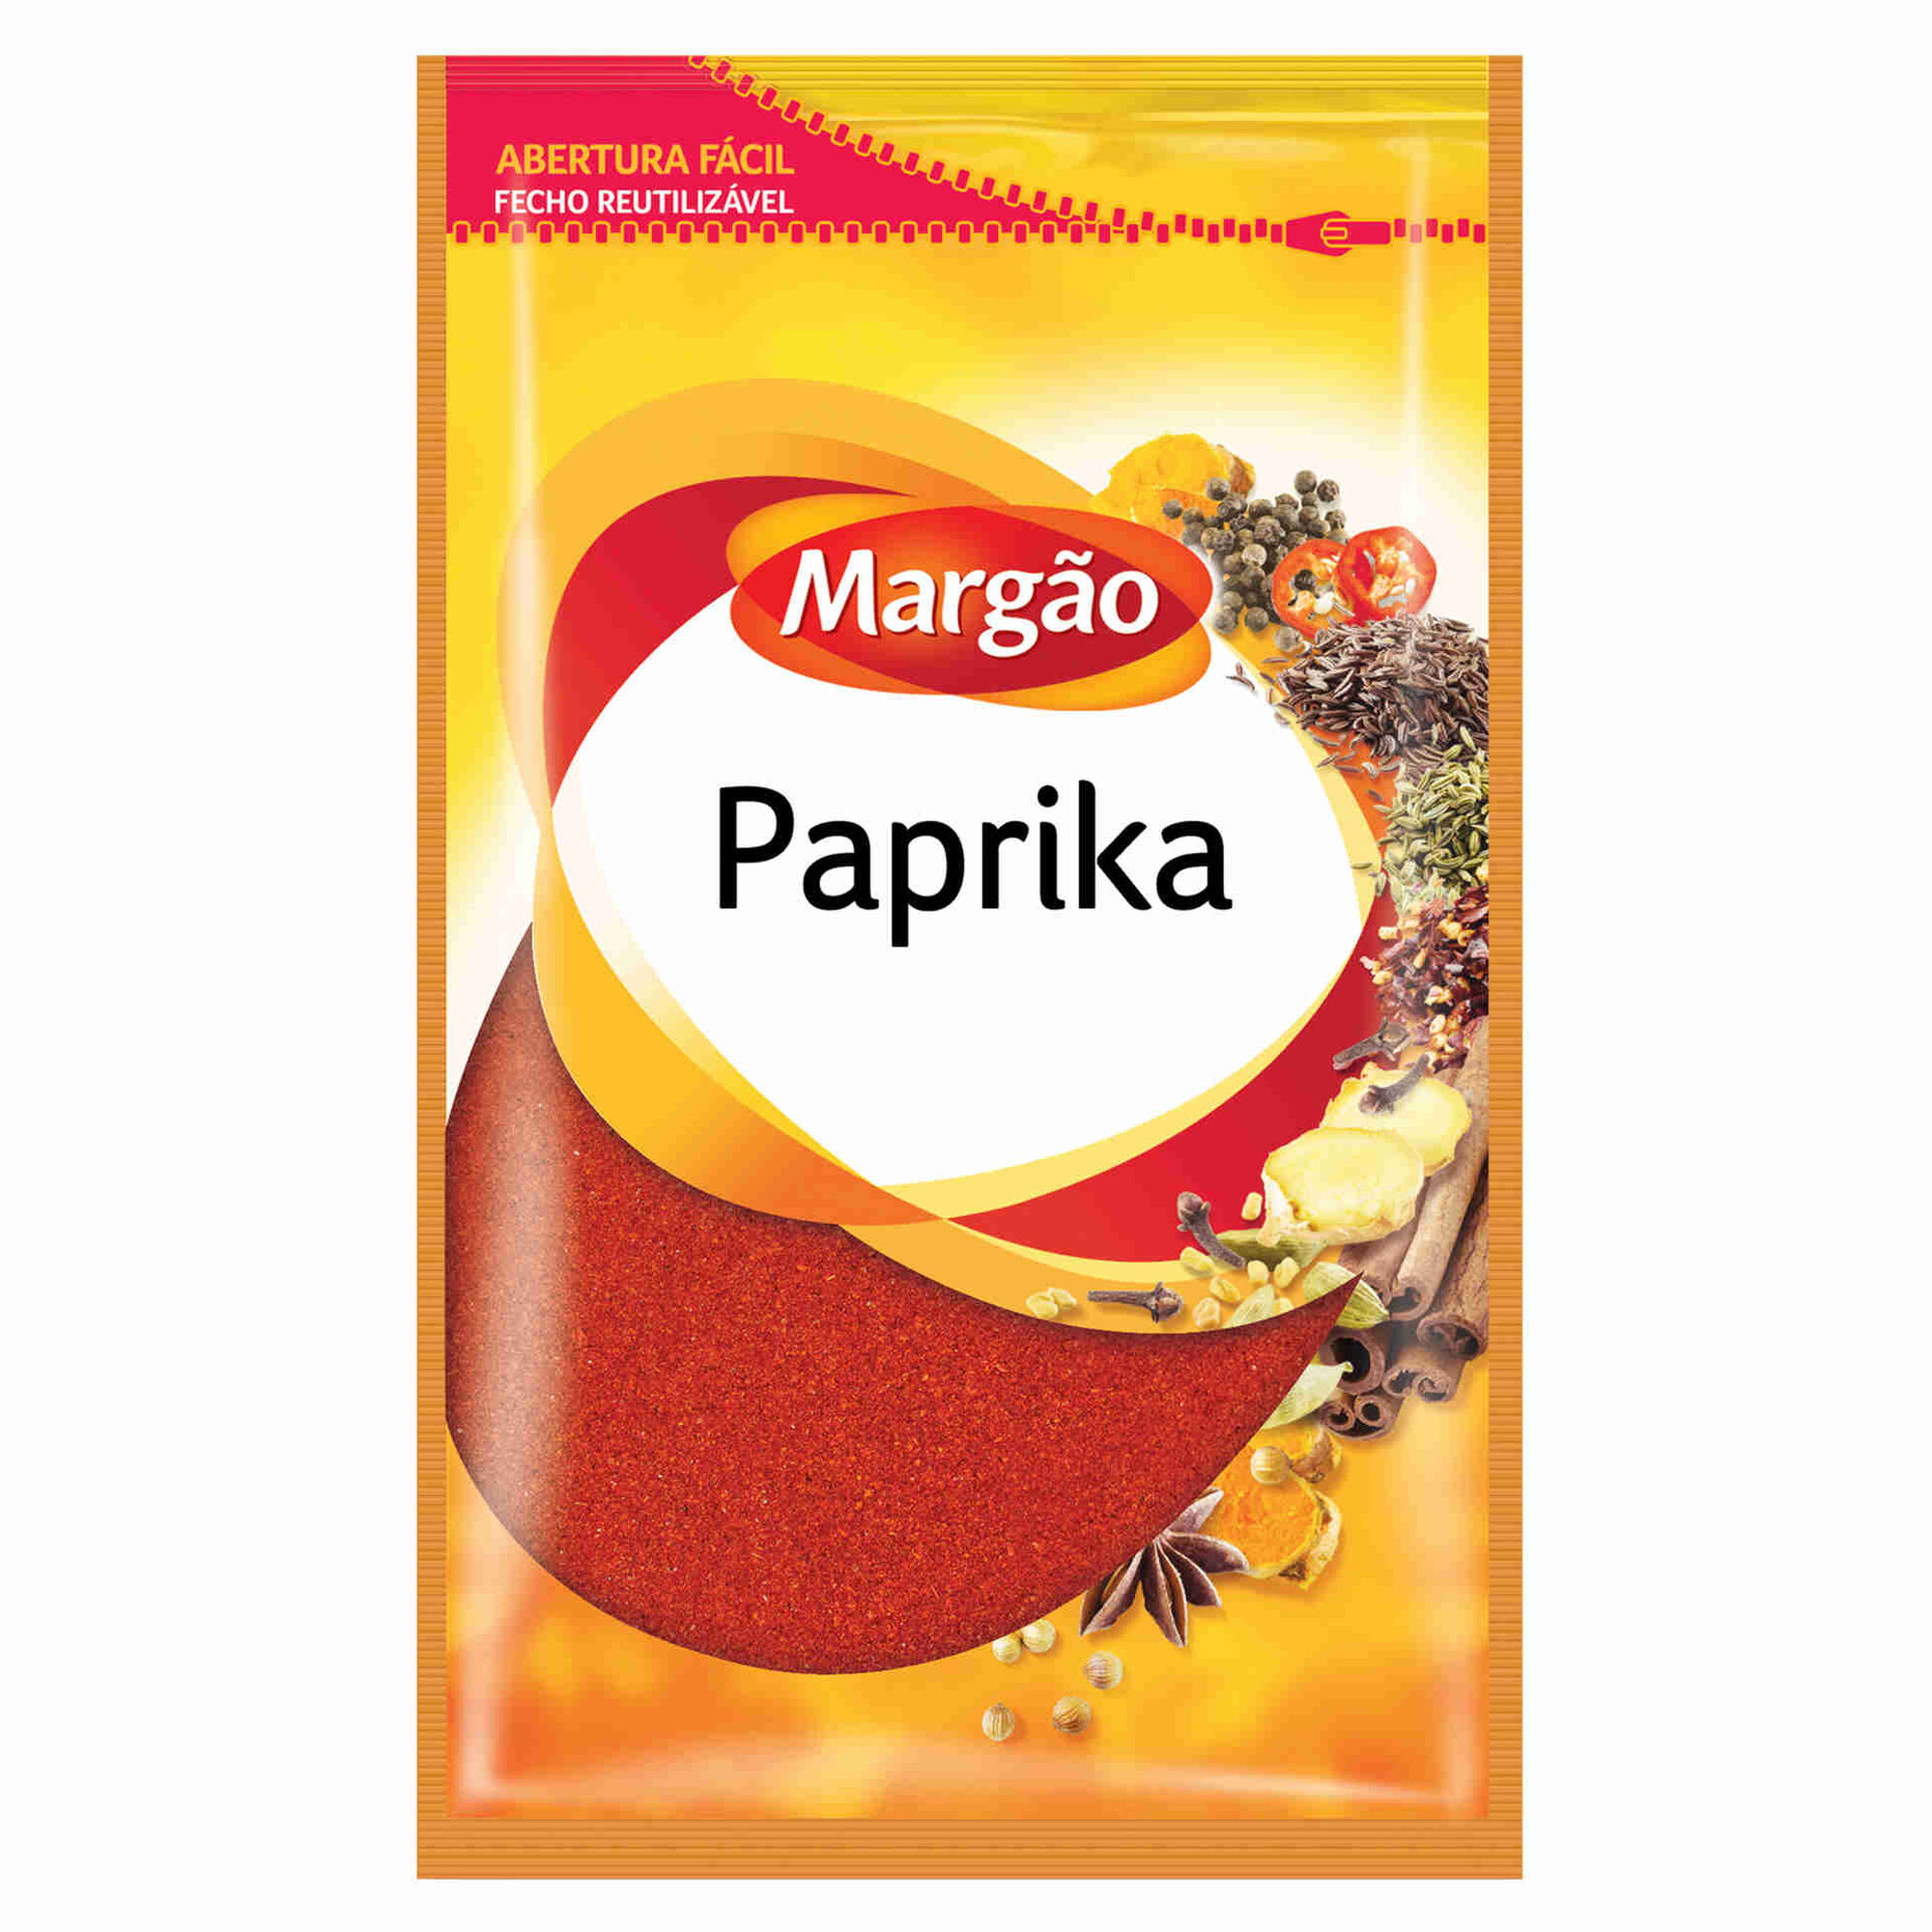 Paprika em Saqueta